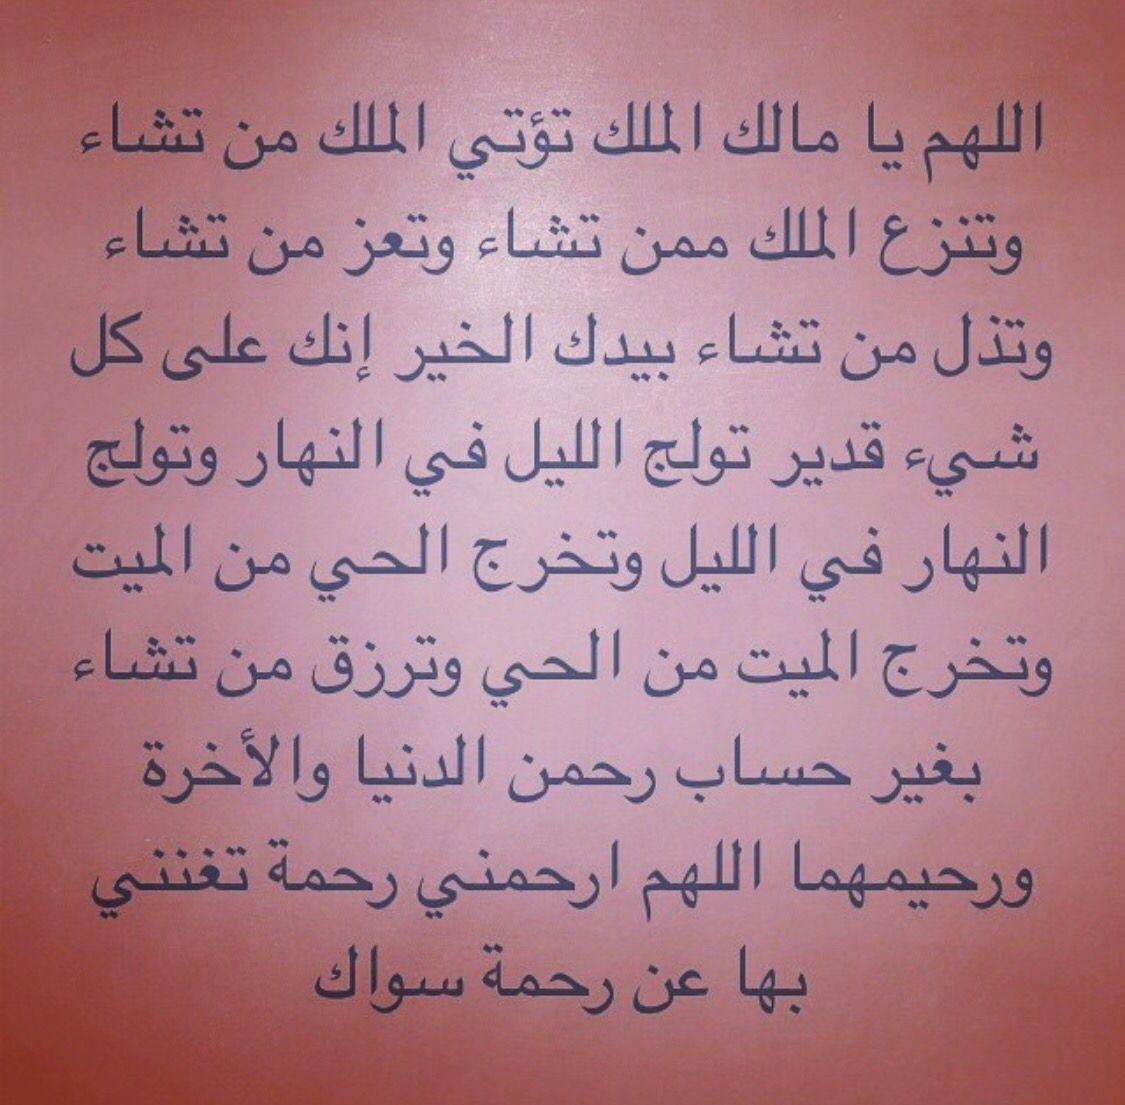 Pin By Sam Mom On دعاء Islamic Quotes Allah Love Islam